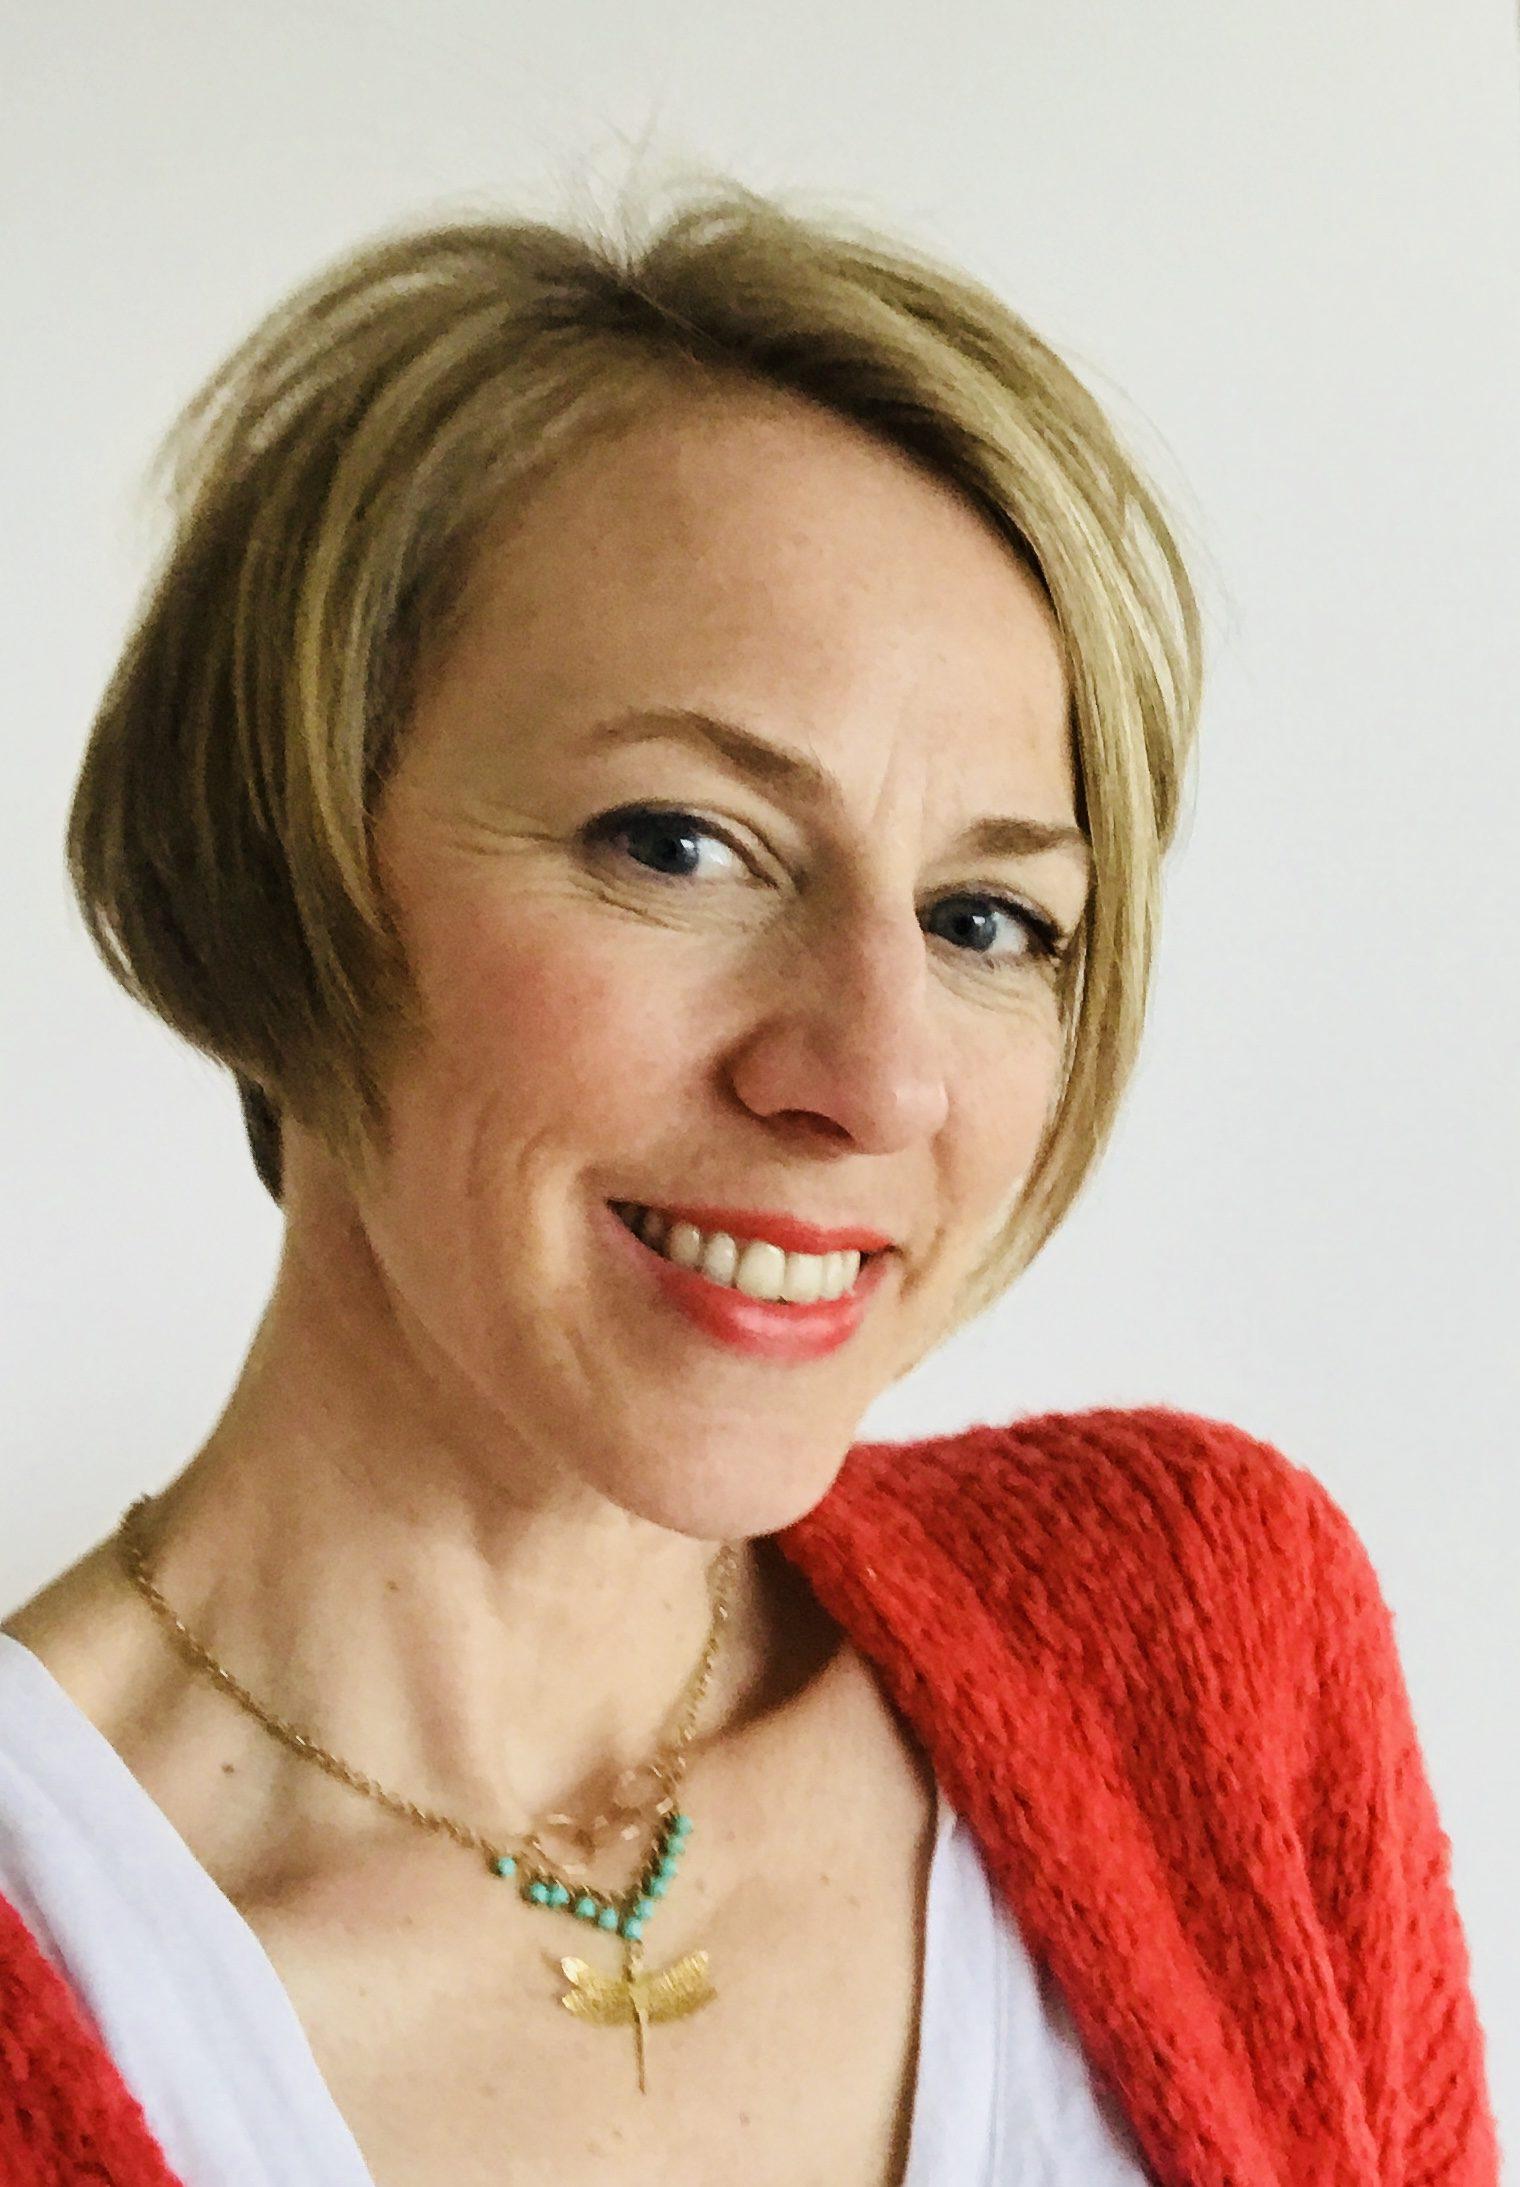 Anke Hennings-Huep